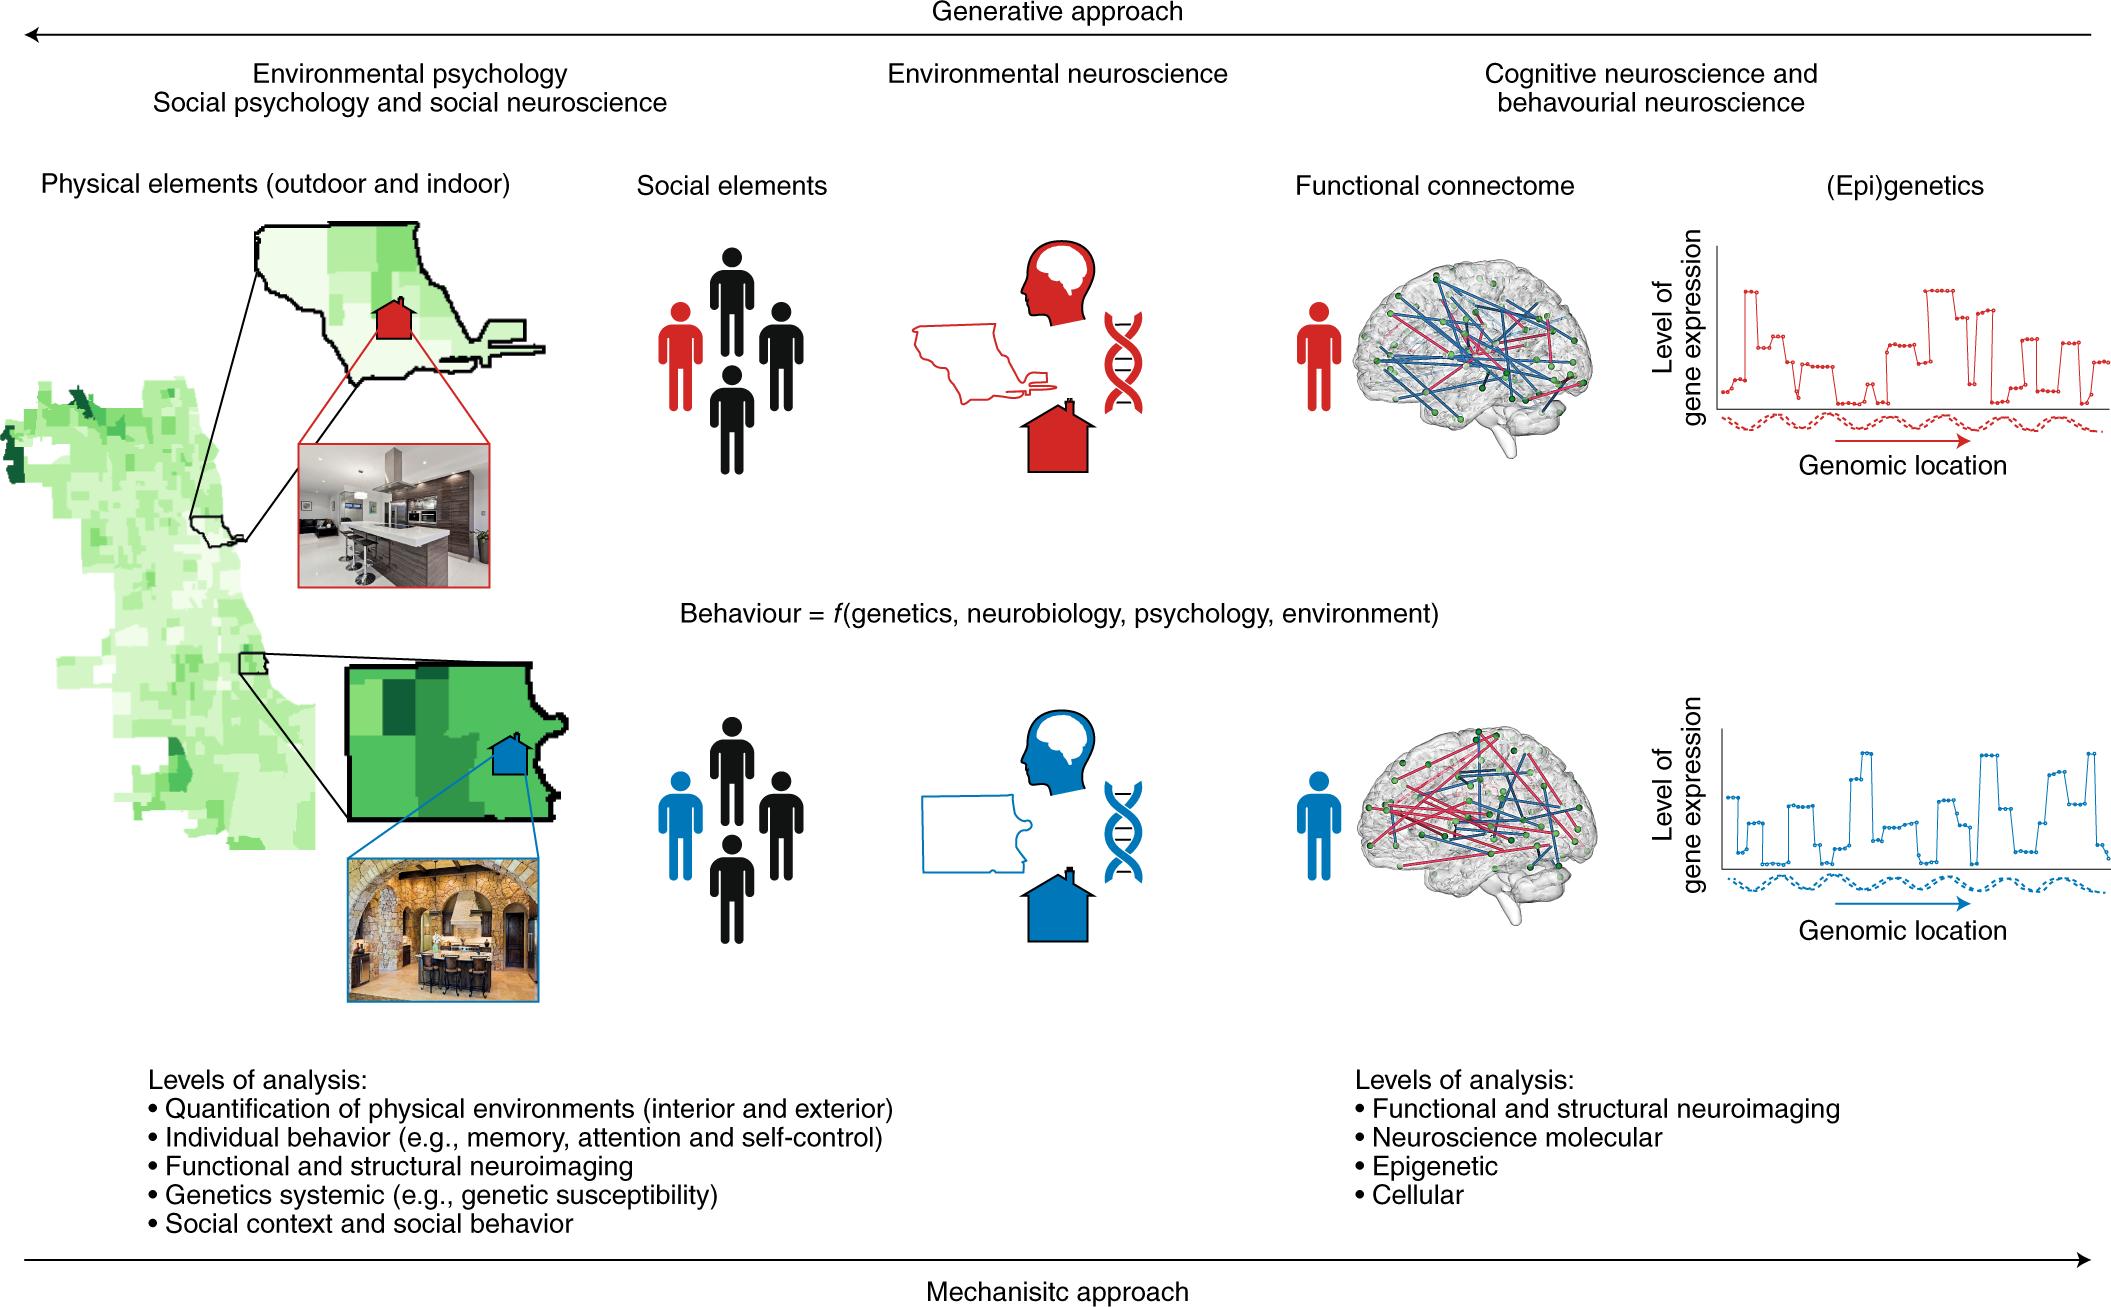 Neglecting Neuroscience Has Criminal >> The Promise Of Environmental Neuroscience Nature Human Behaviour